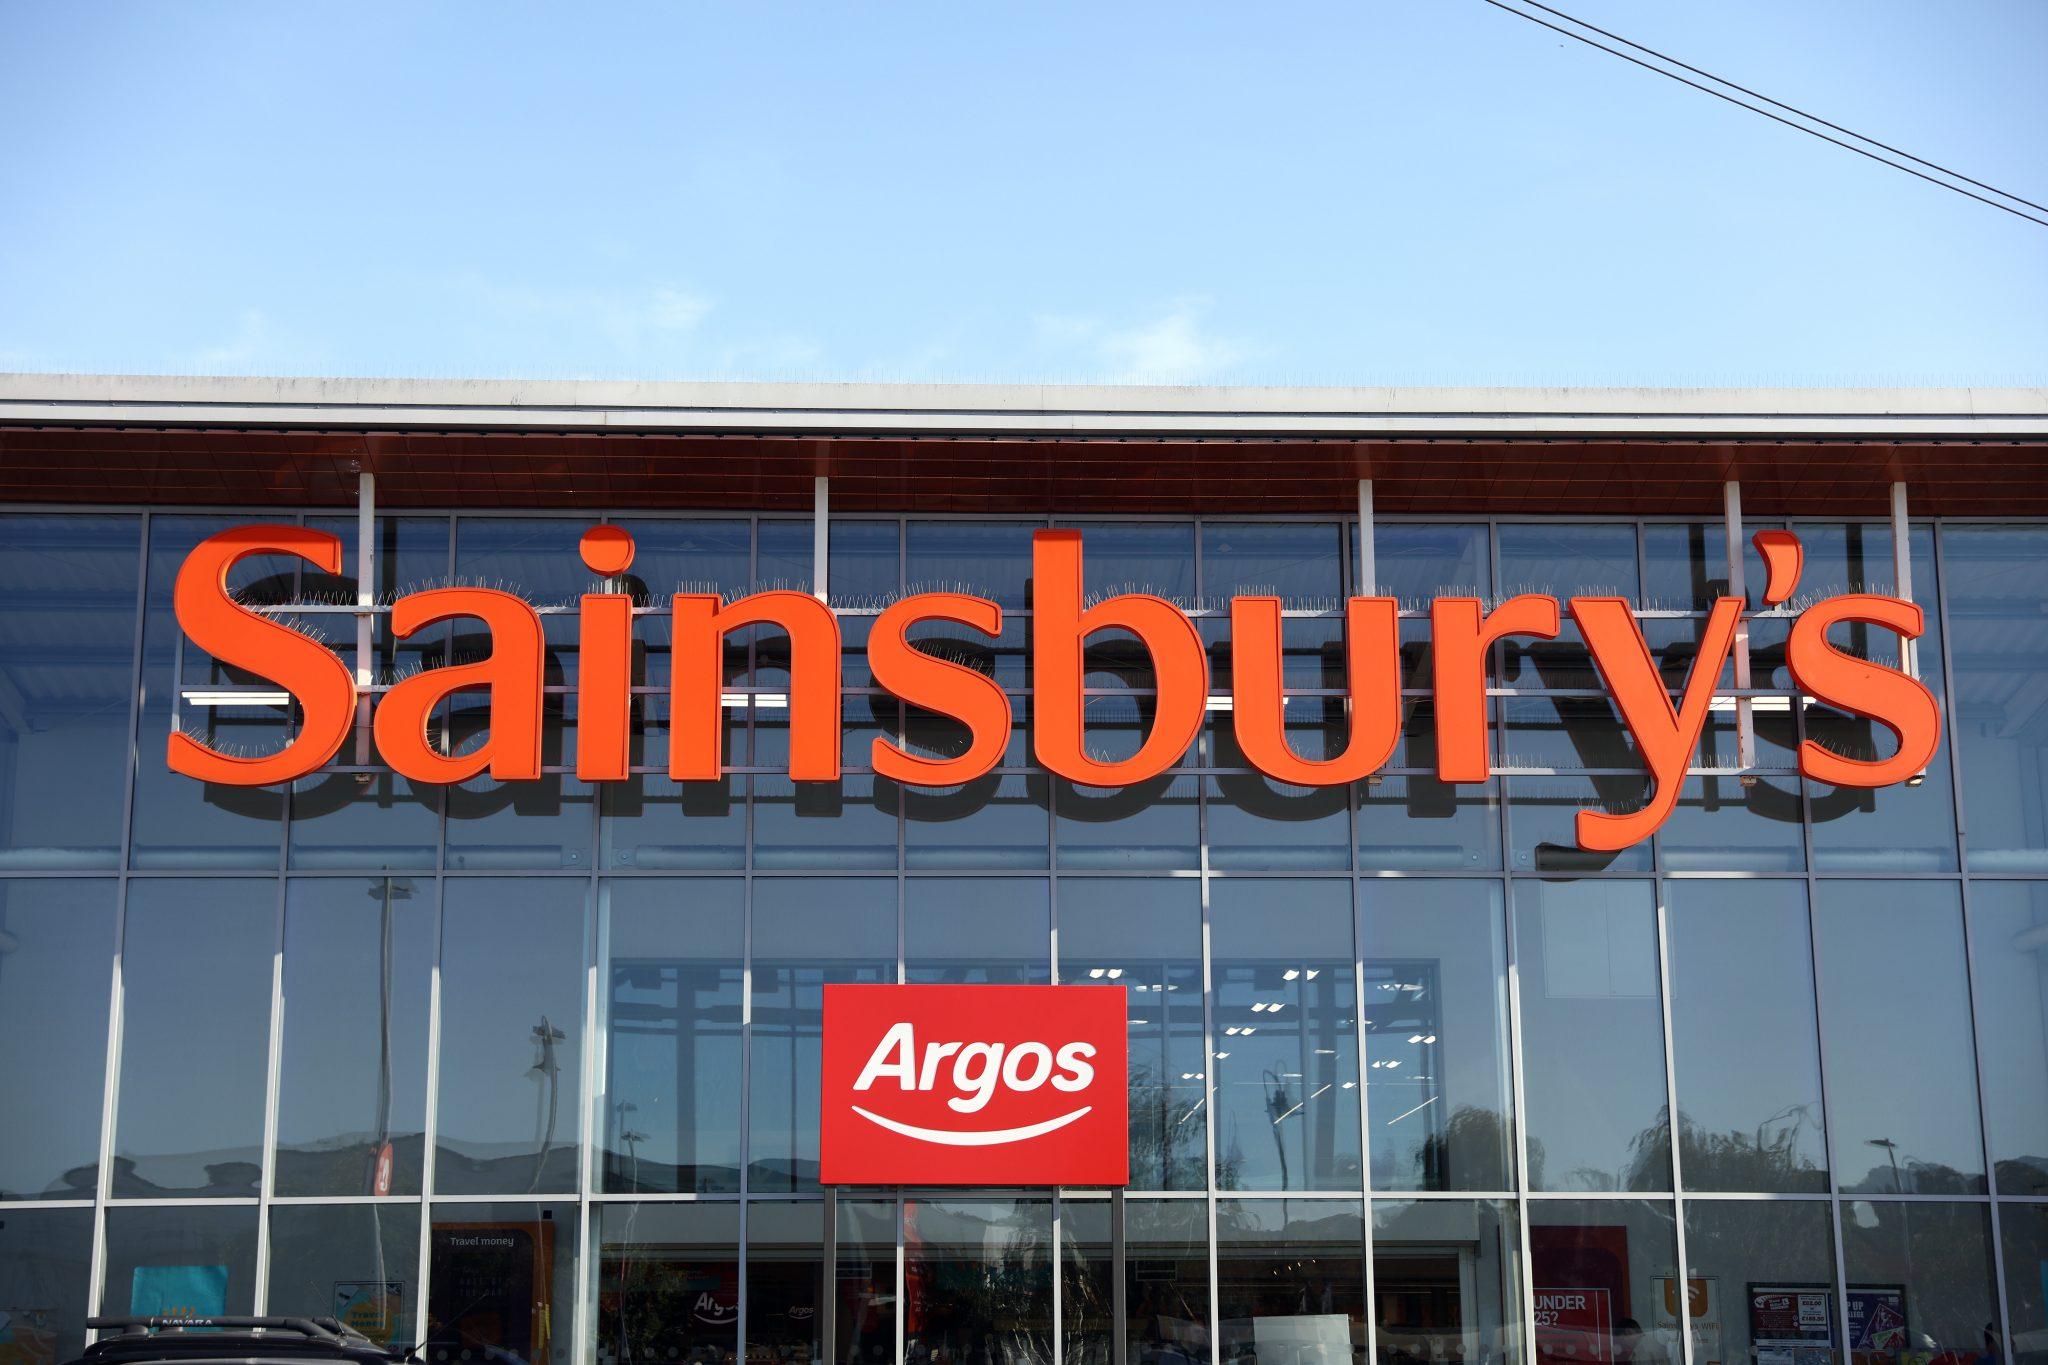 Sainsbury's announces new plastic recycling initiative